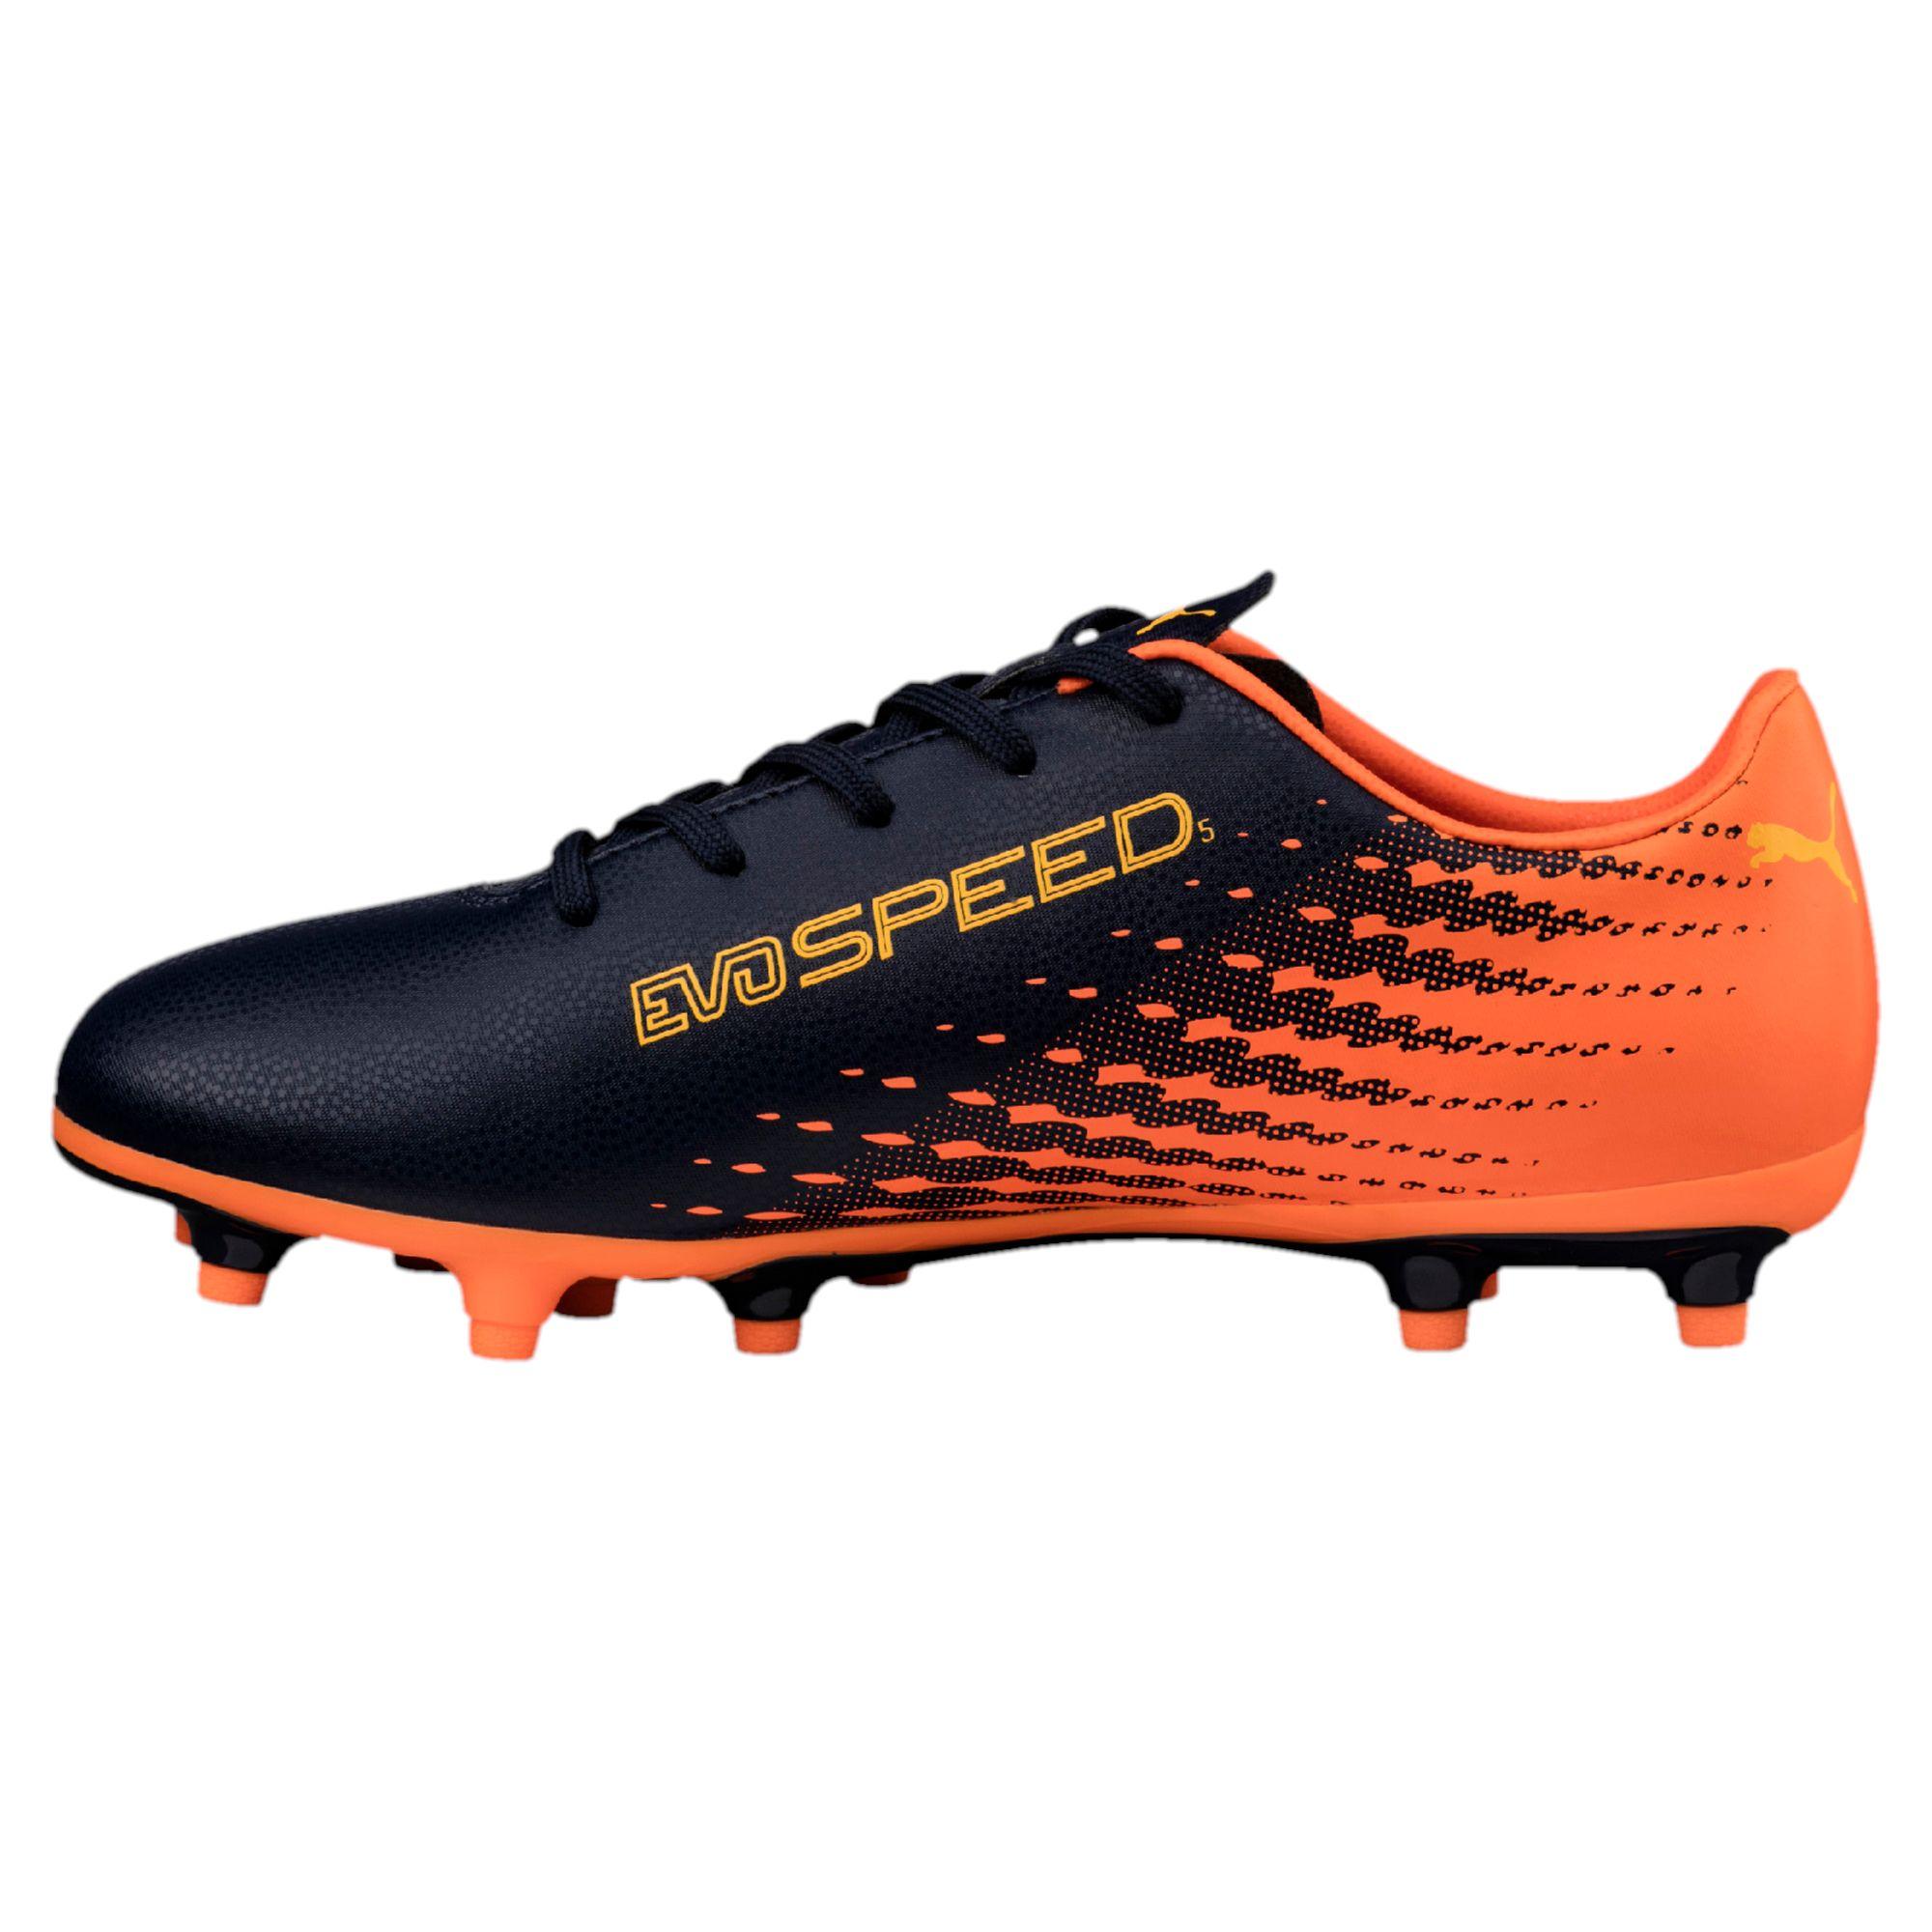 PUMA evoSPEED 17.5 FG Kinder Fußballschuhe Unisex Schuhe Fußball Fußball Fußball Neu dd8e35